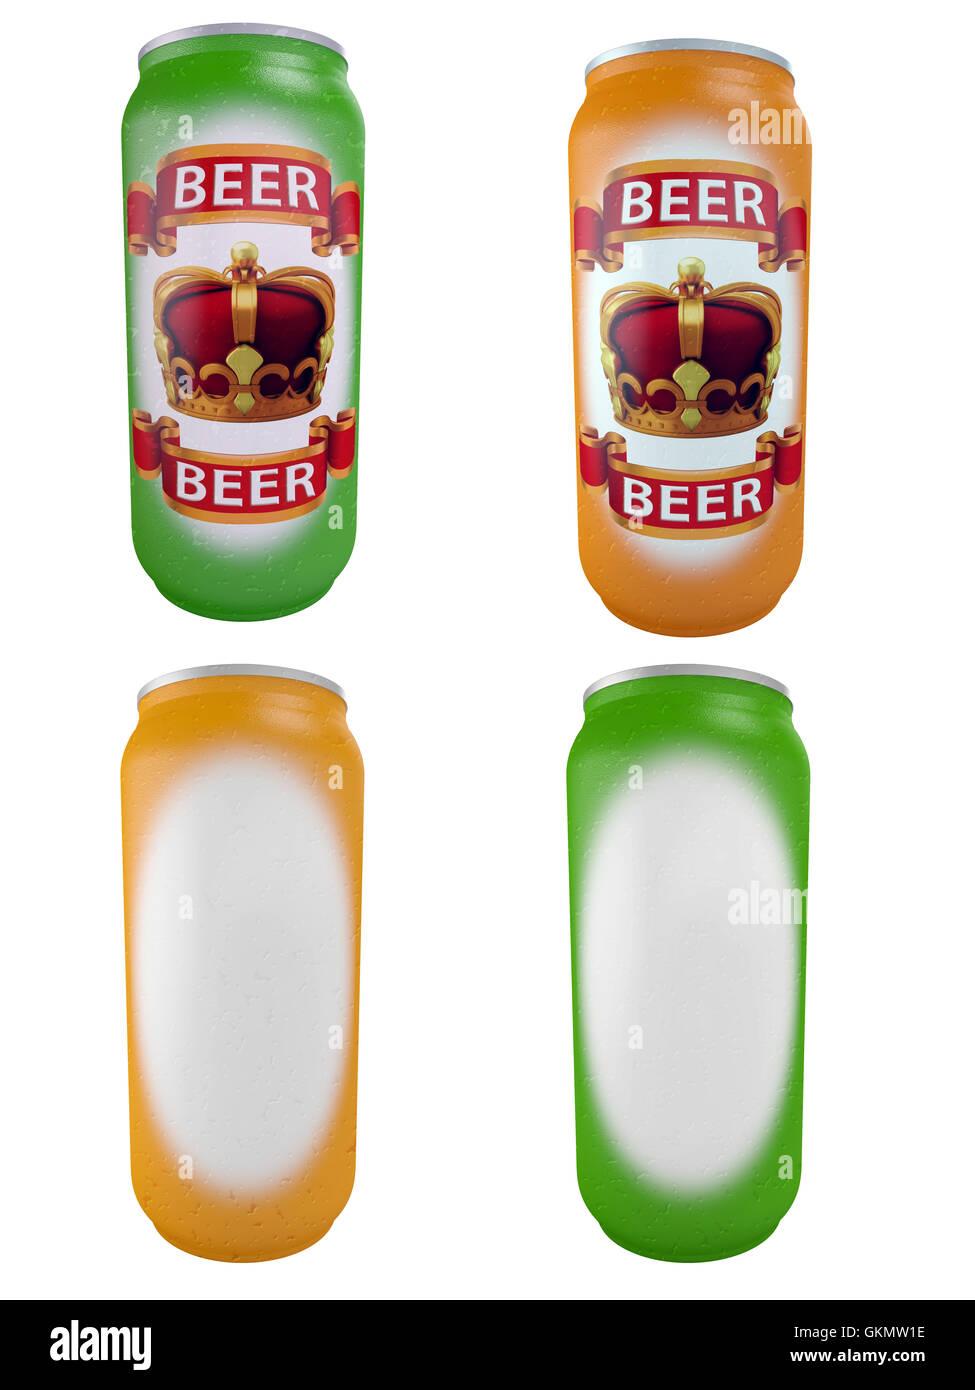 aluminium jars for beer - Stock Image